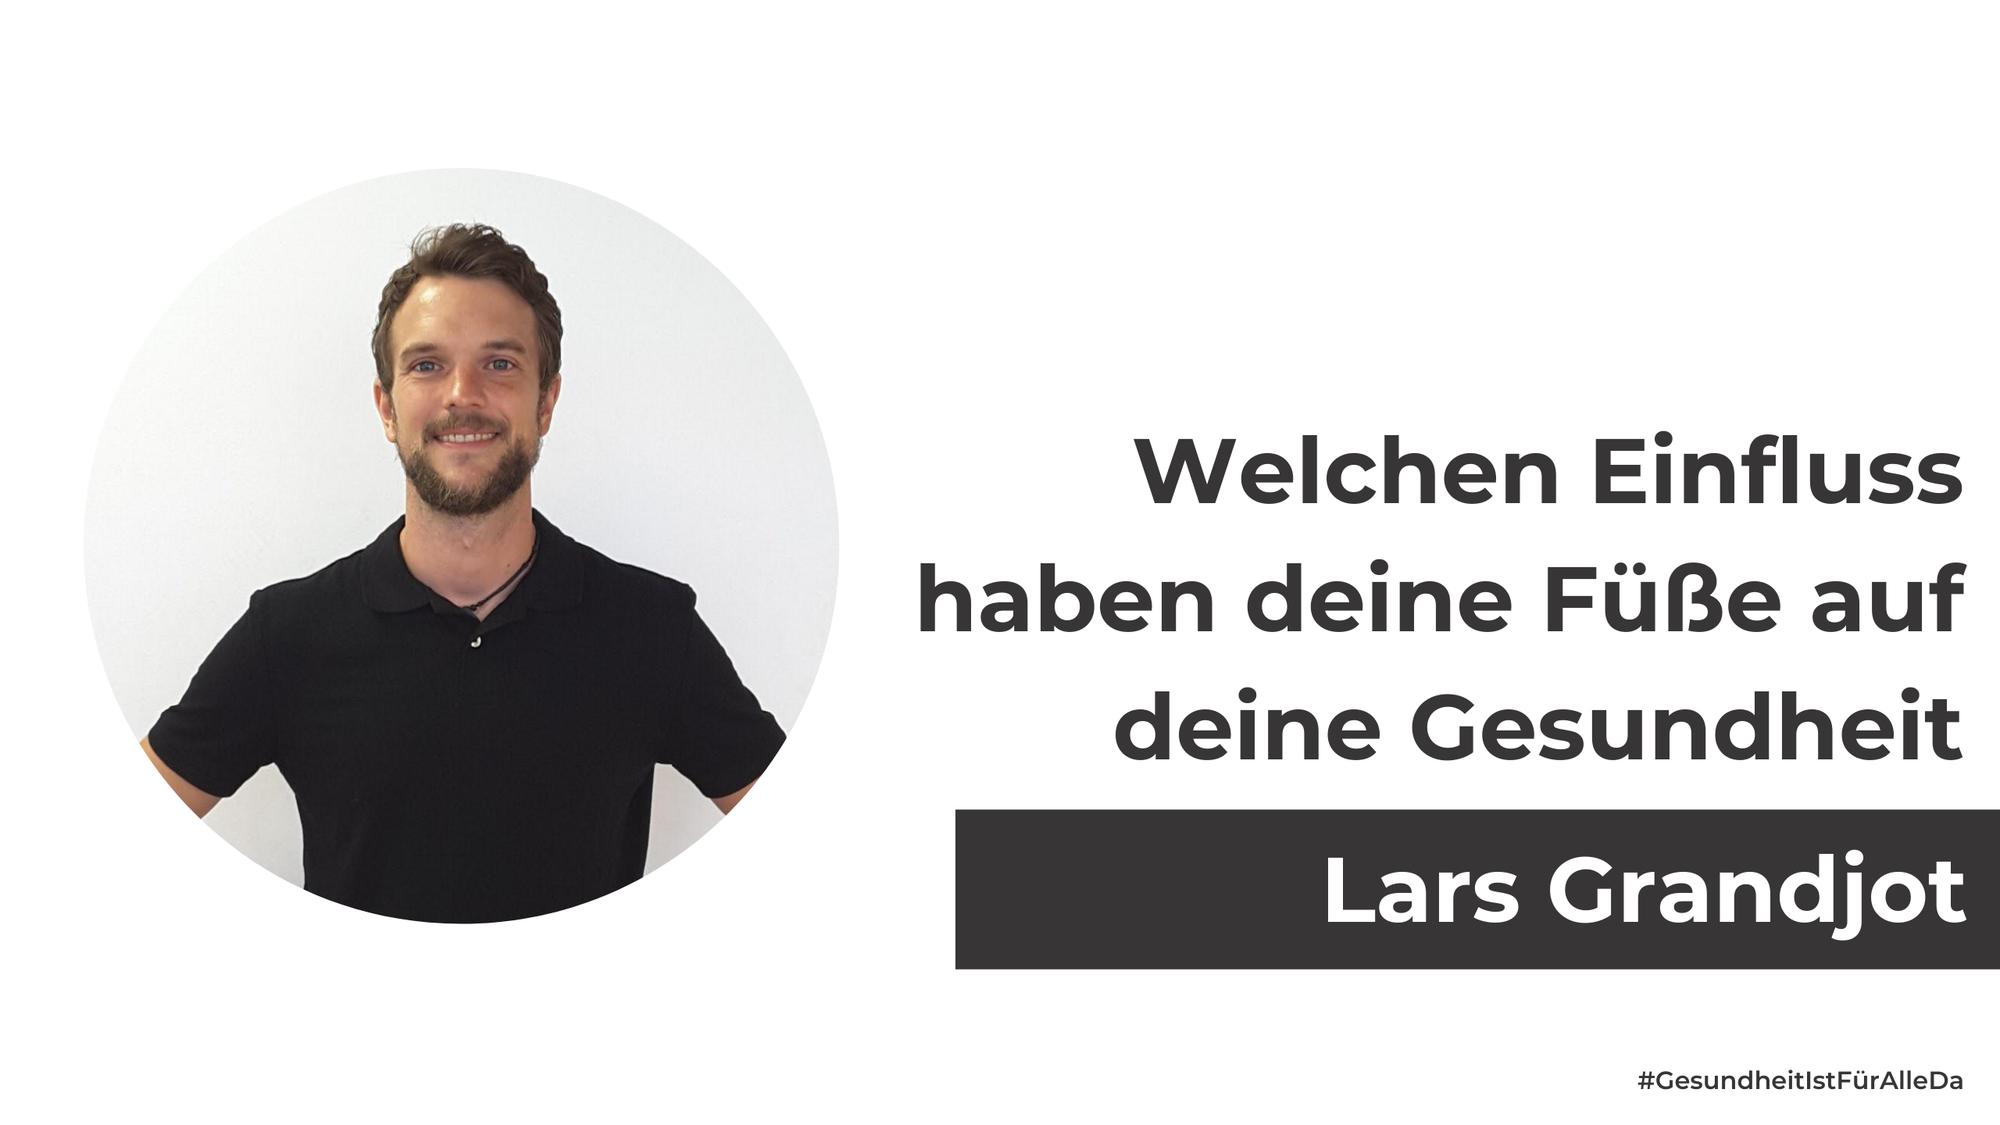 Lars Grandjot